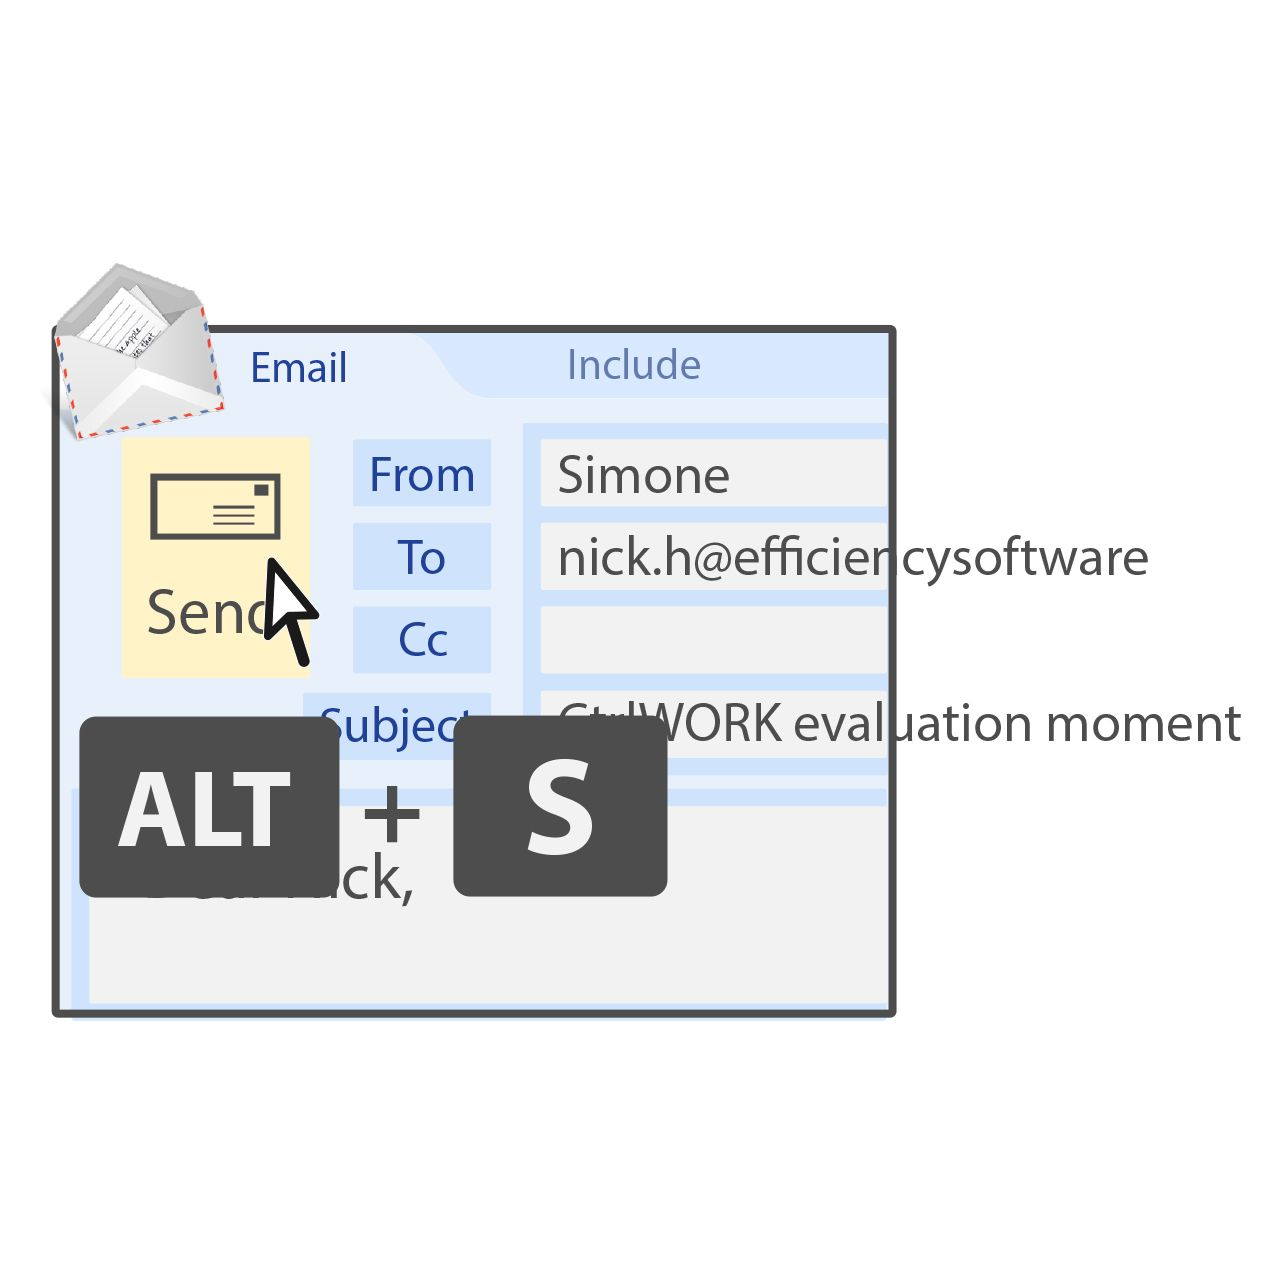 altmouse software arbosoftware ARTNRNNB alt+s